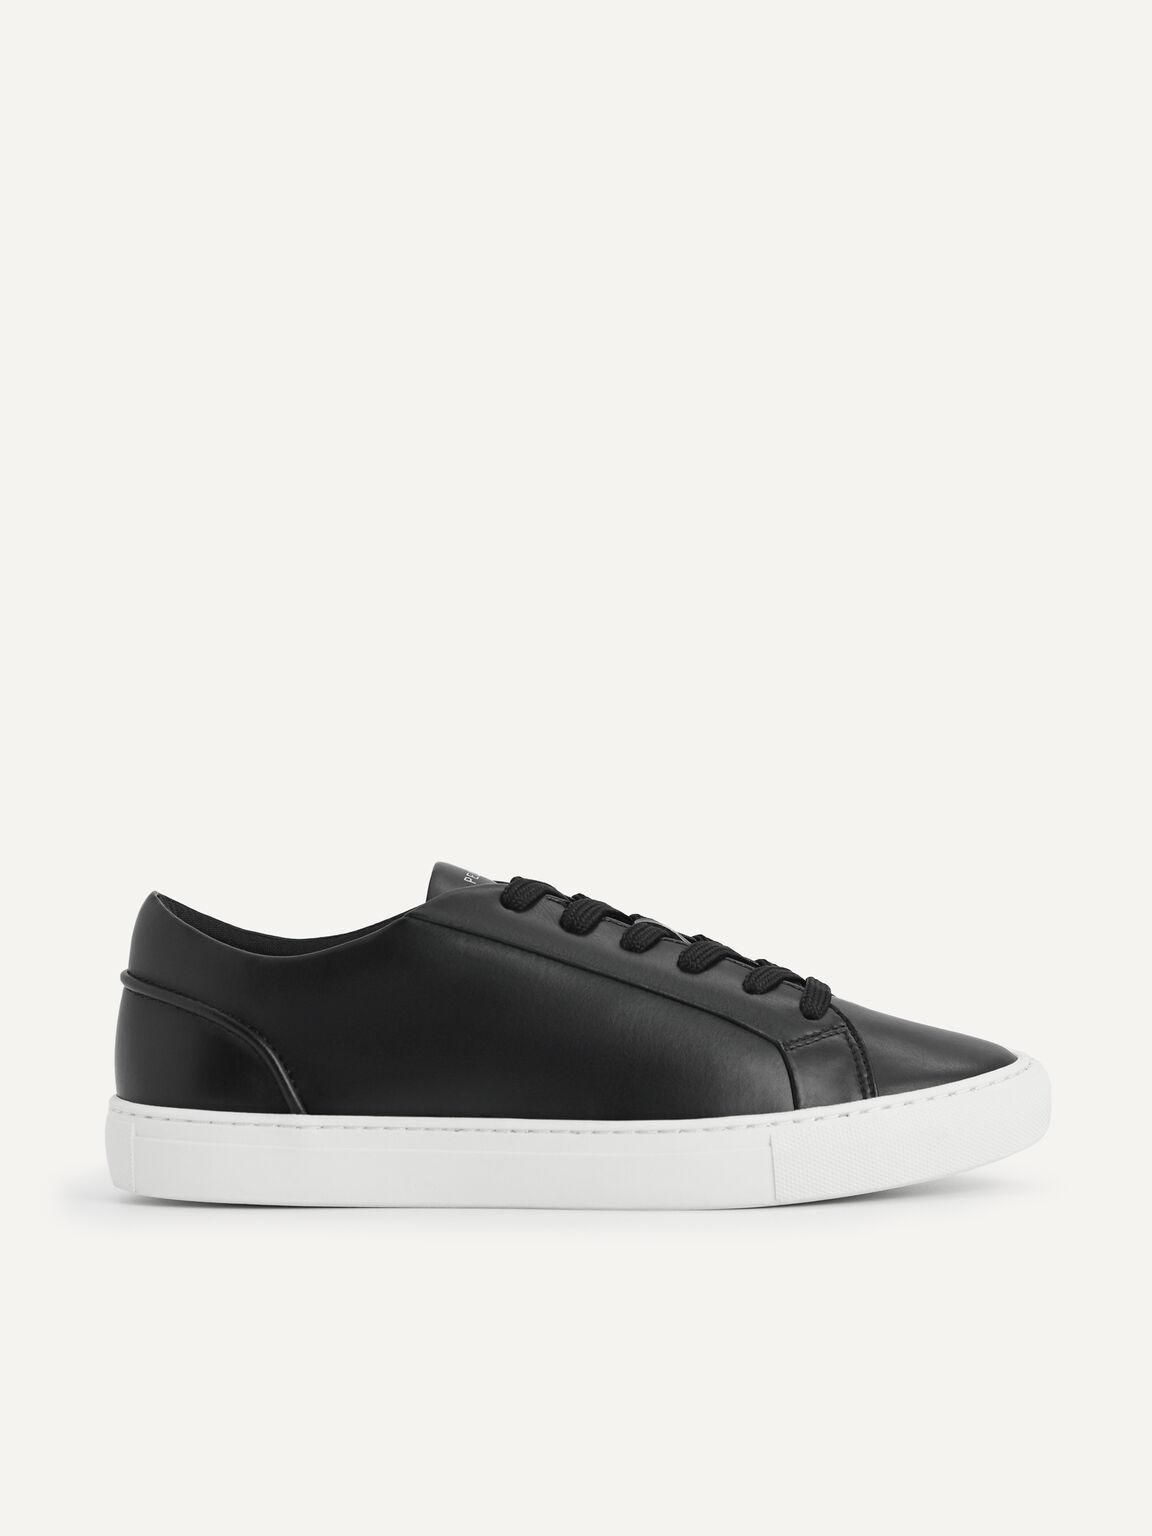 Atlas Lace-up Sneakers, Black, hi-res